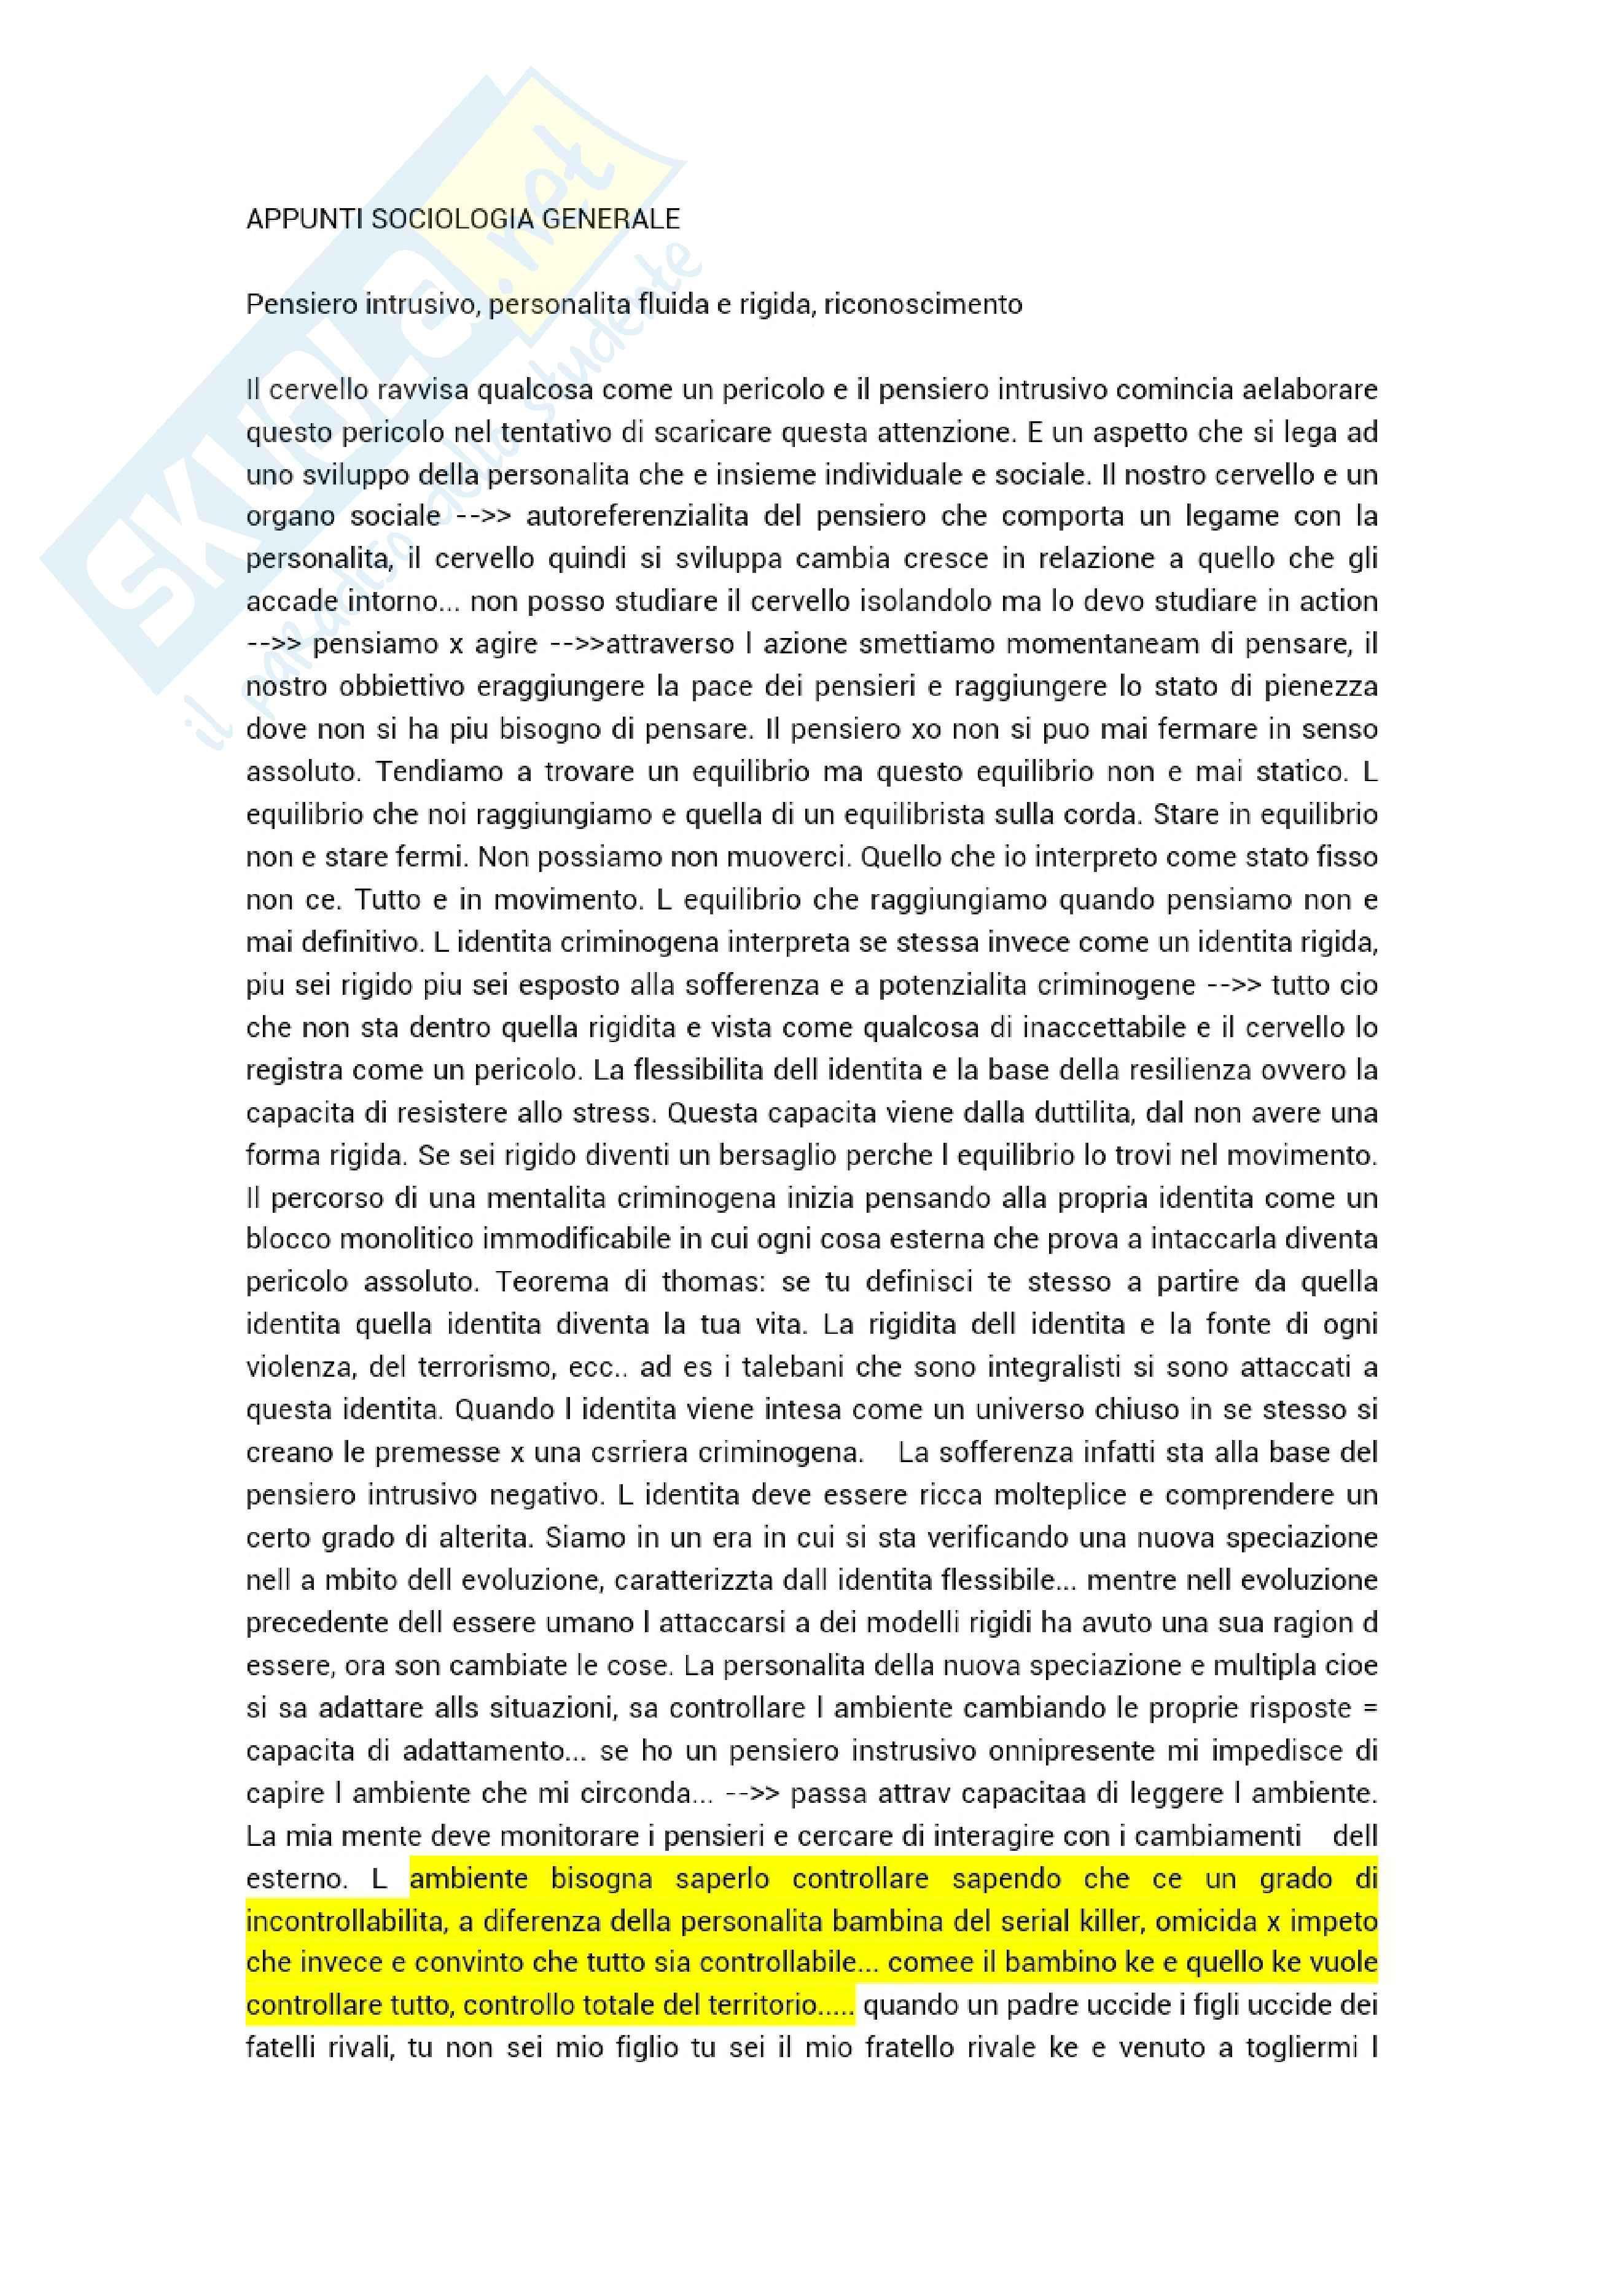 Sociologia generale 1